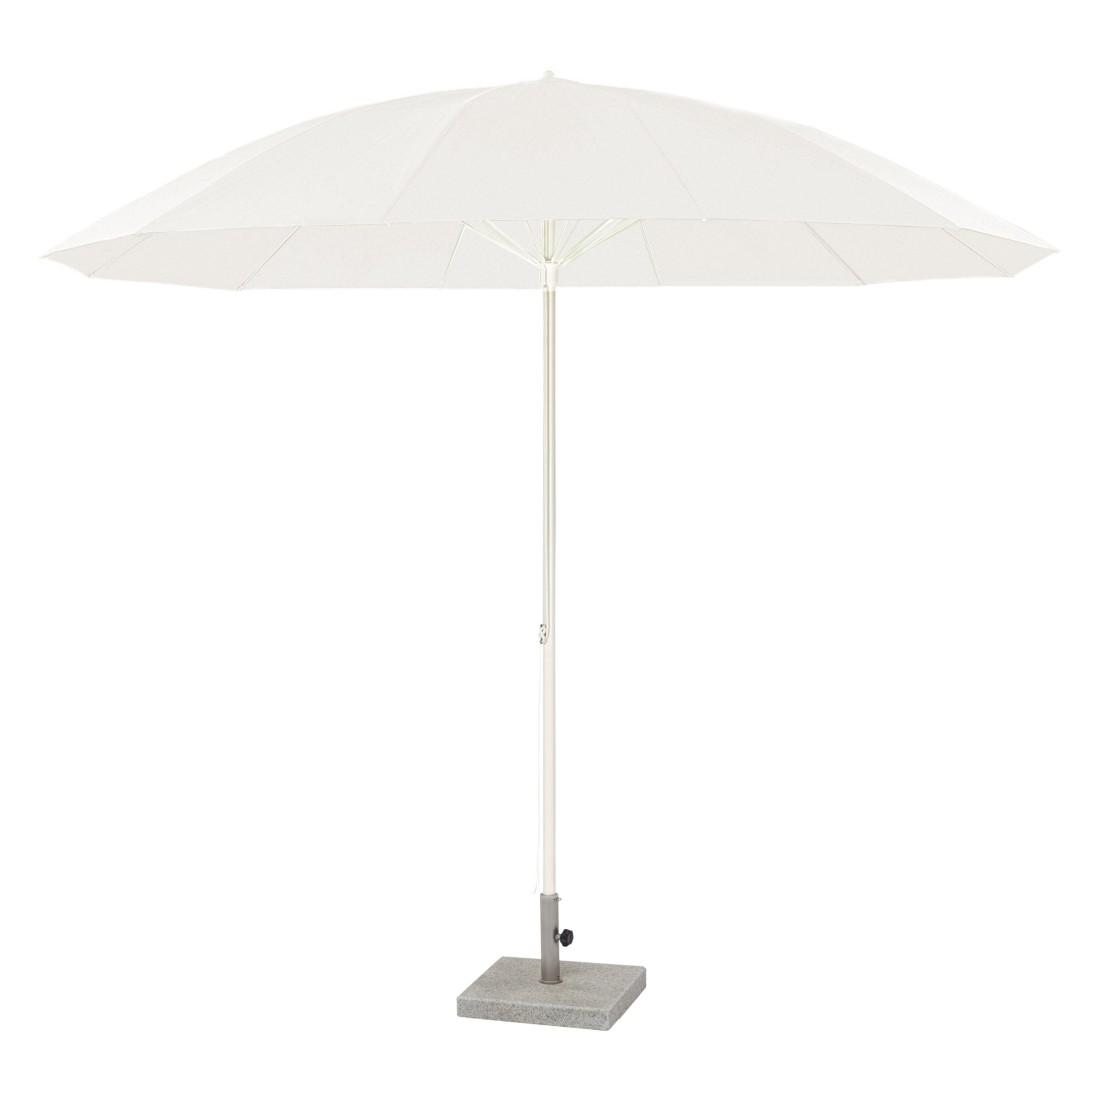 Sonnenschirm Pagodenschirm mit Knickgelenk - Aluminium Weiß, Weishäupl Werkstätten